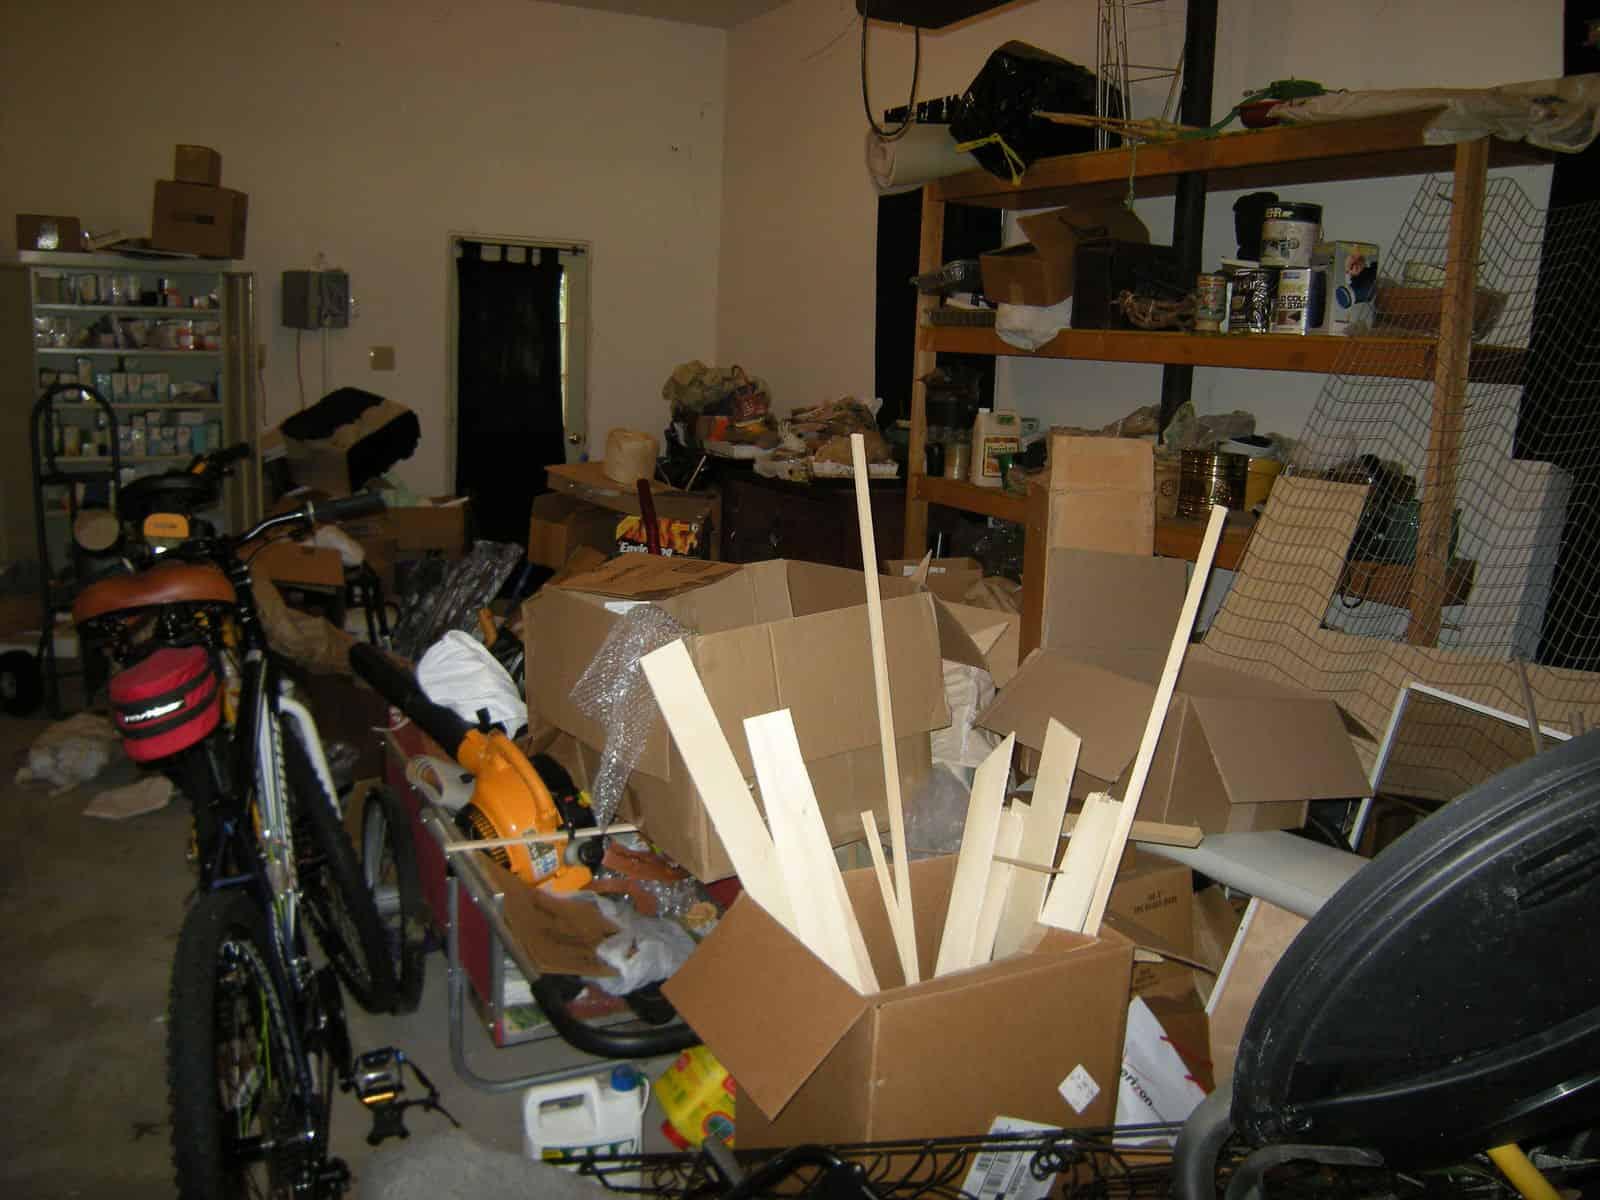 shelving in an disorganized garage